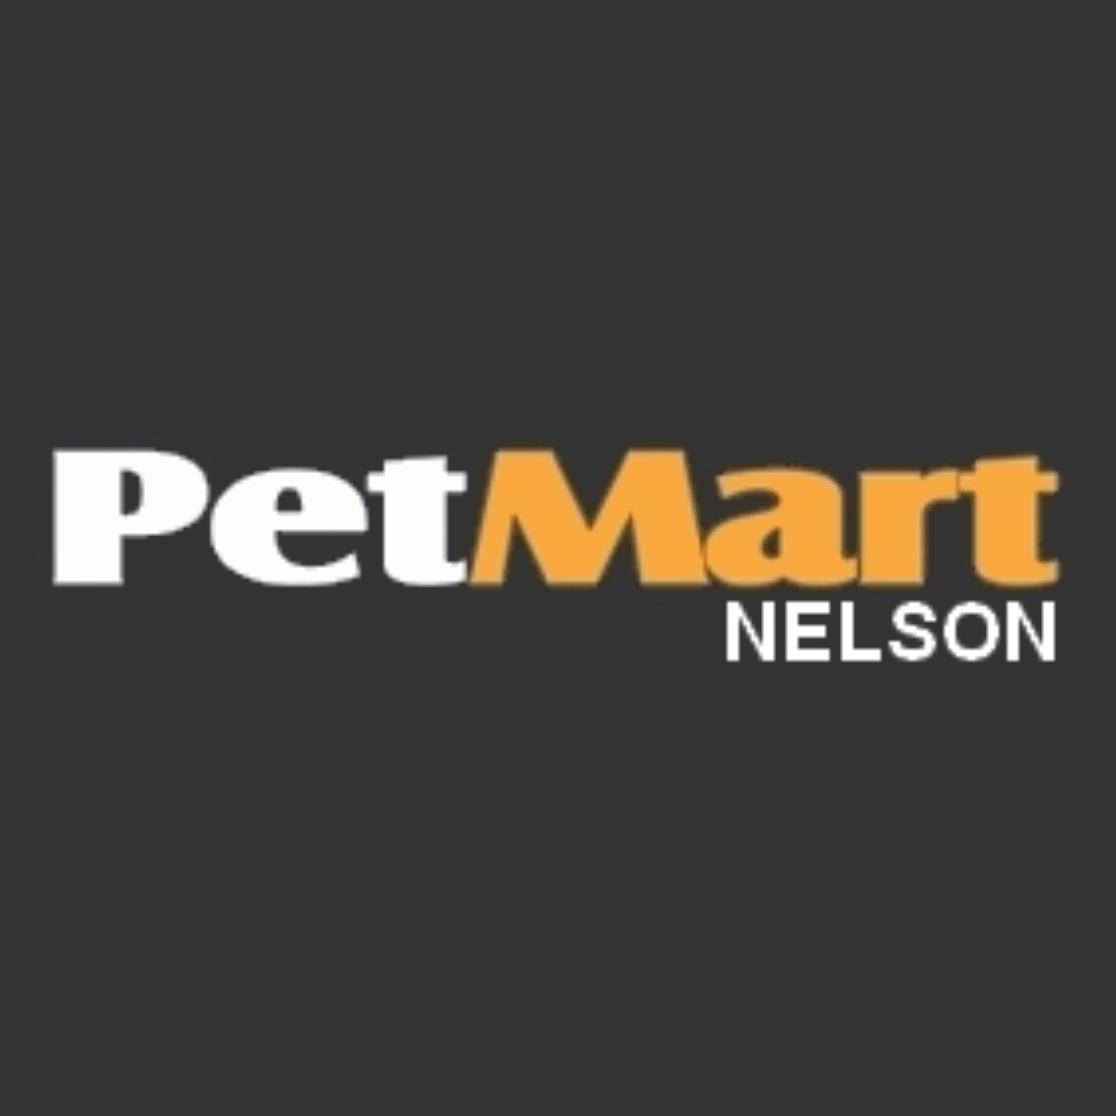 Petmart.png